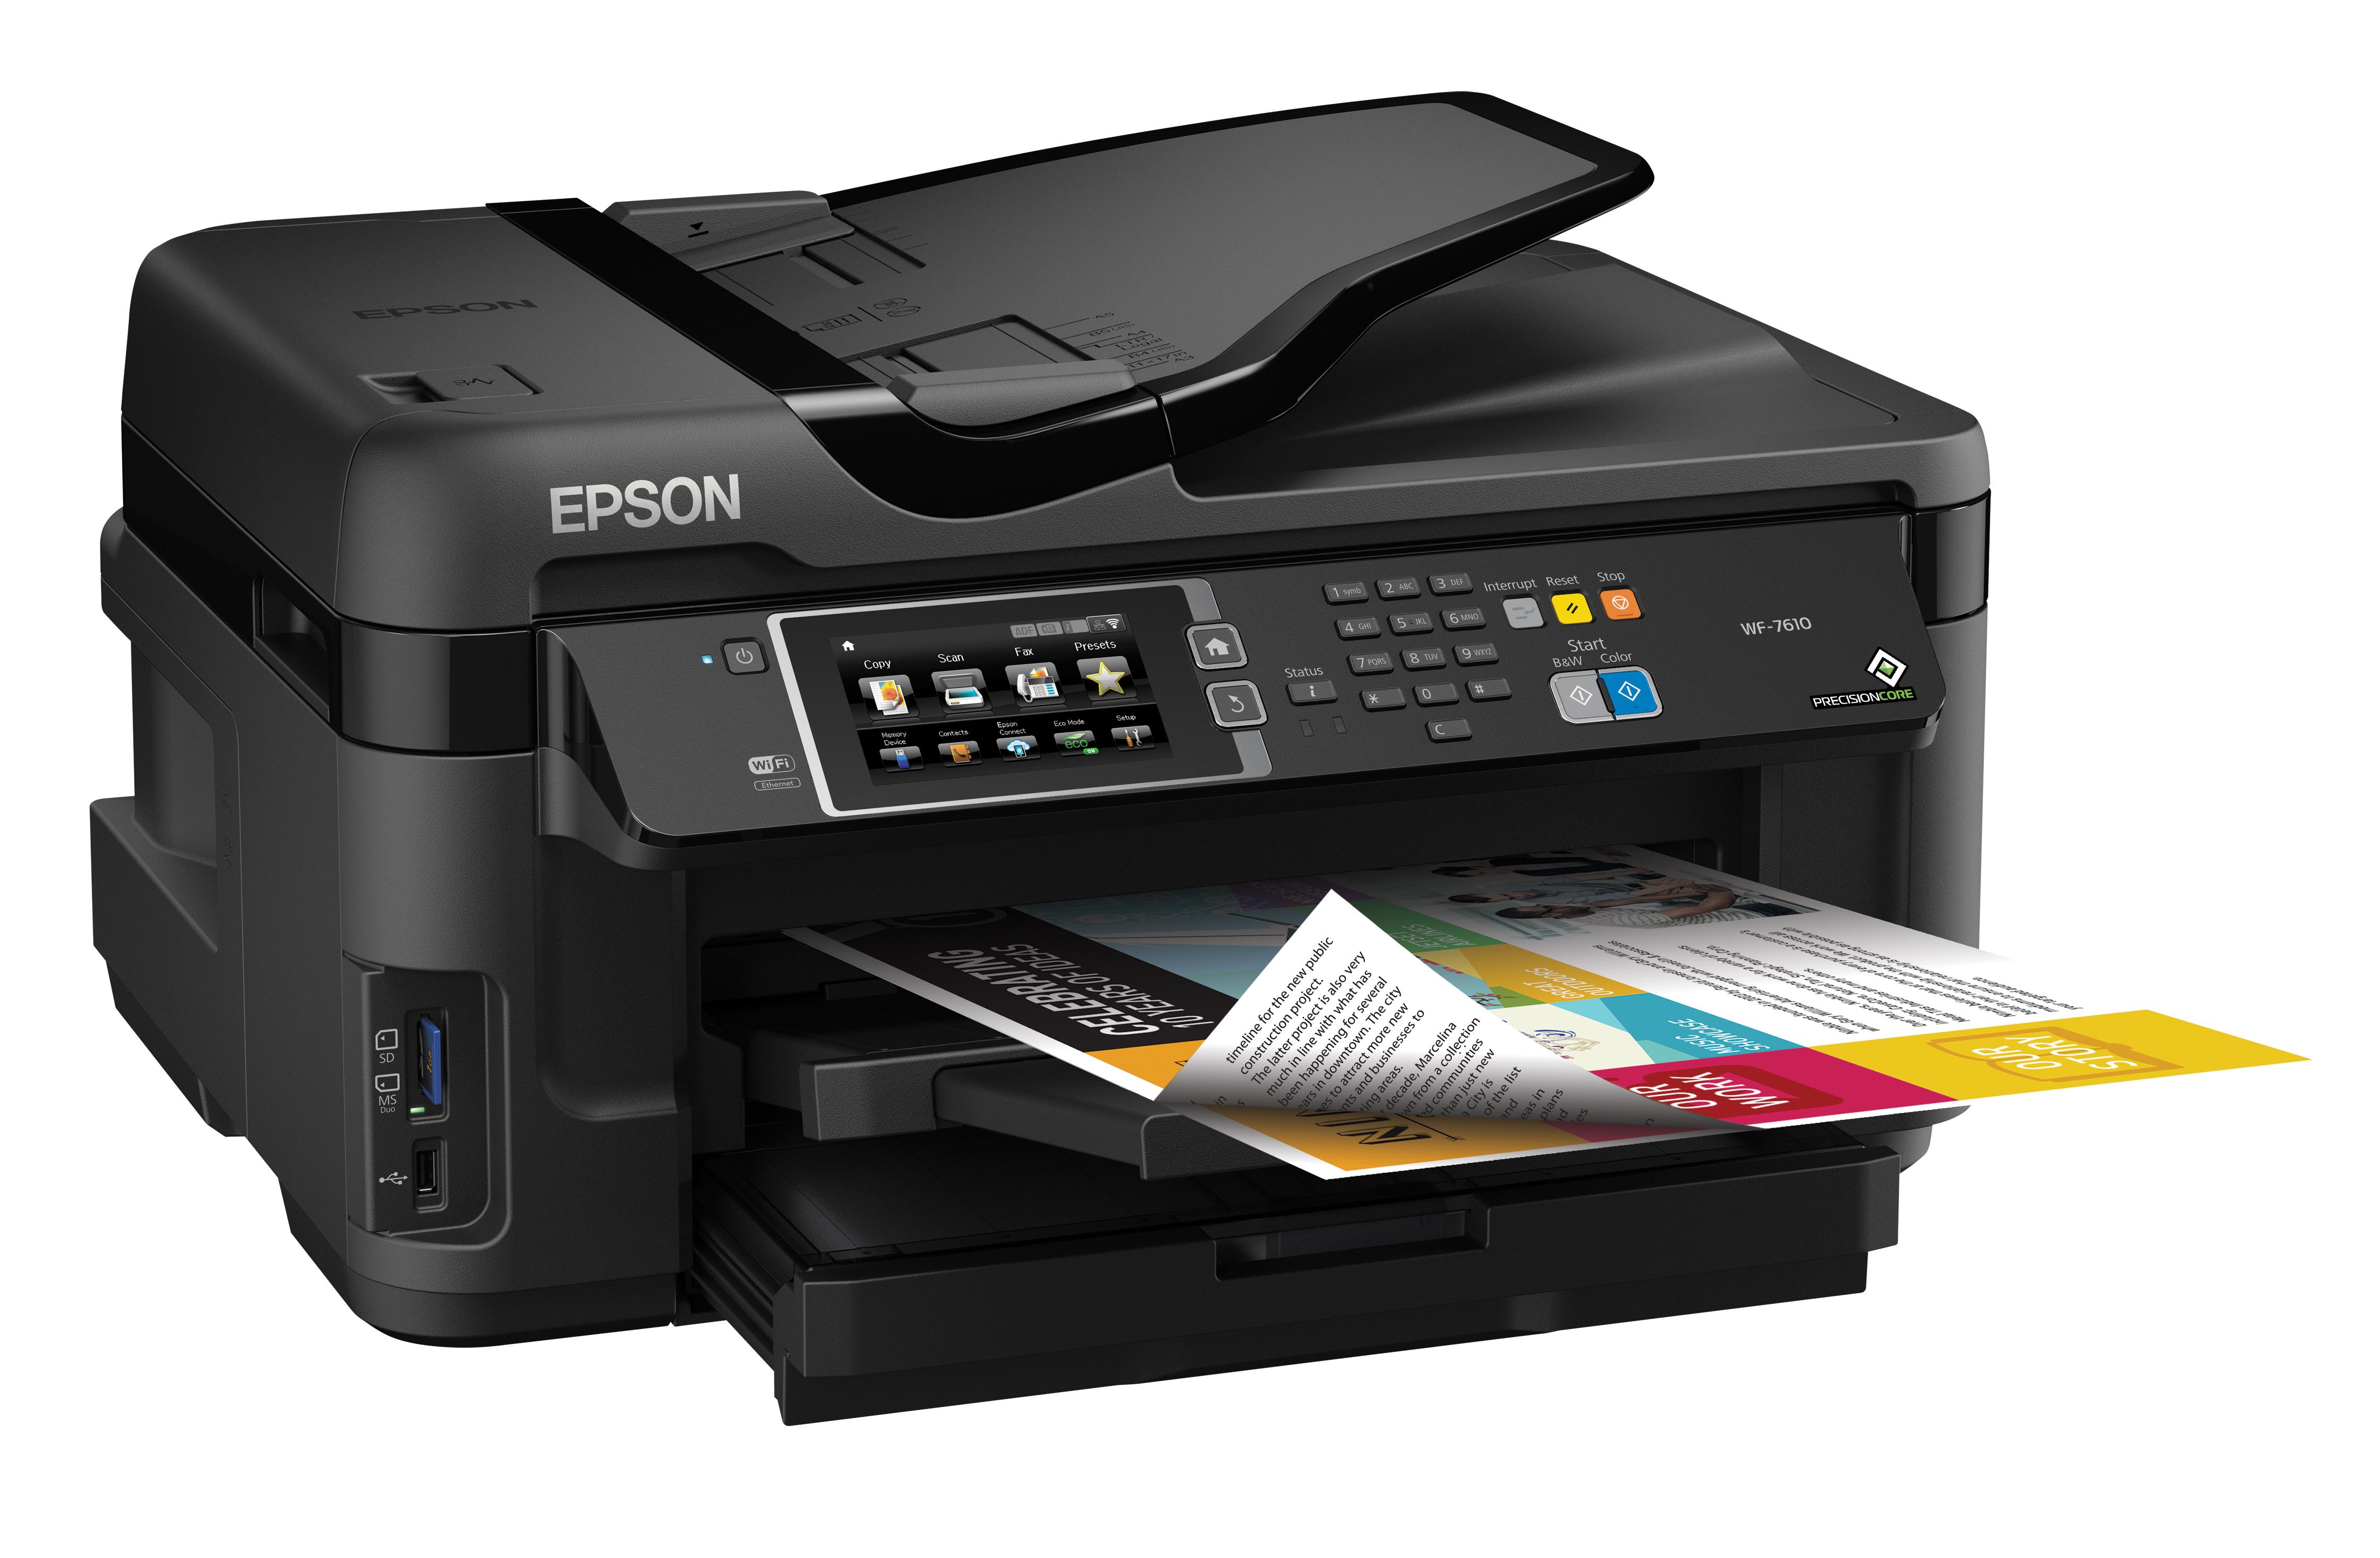 epson workforce wf 7610 all in one color printer scanner copier wi fi direct ebay. Black Bedroom Furniture Sets. Home Design Ideas